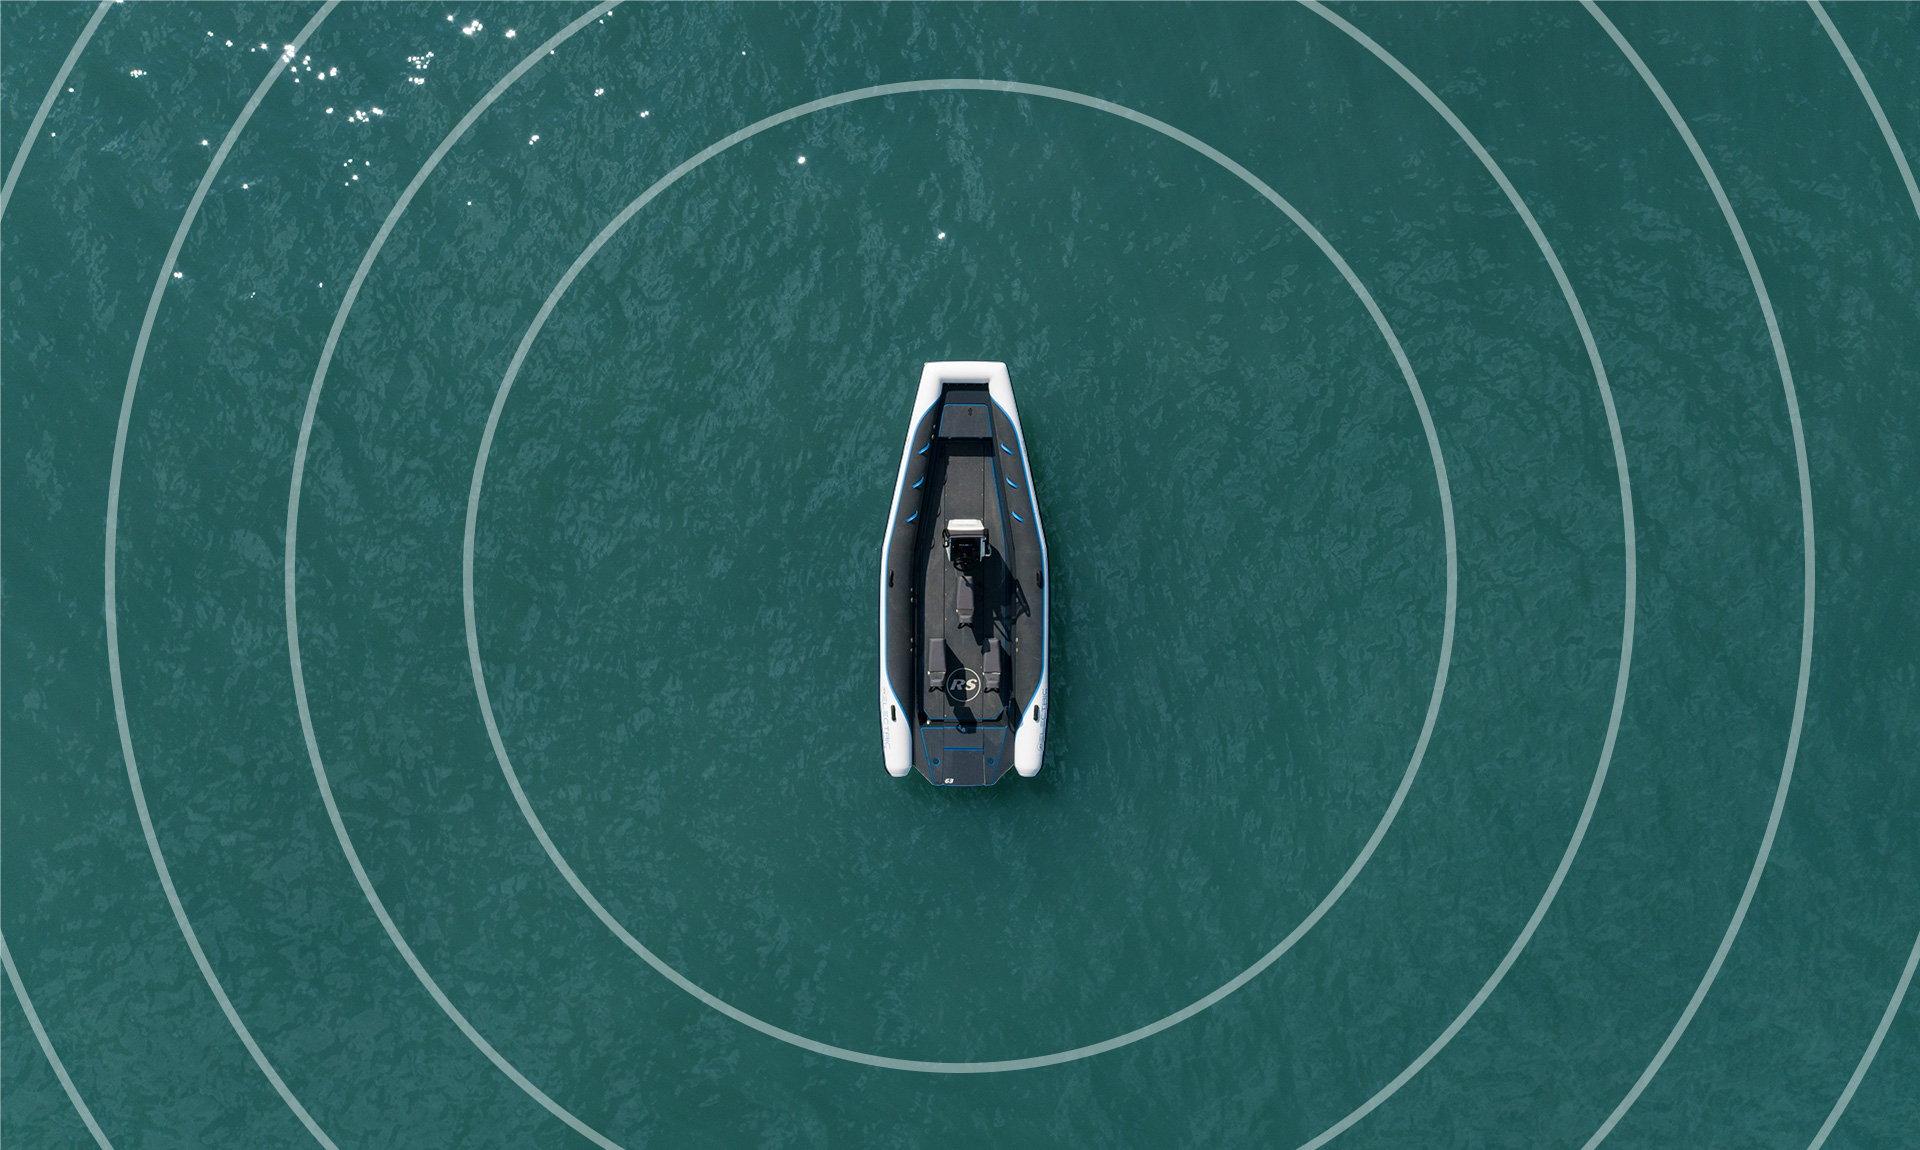 Electric Boat - Pulse 63 RIB - RS Electric Boats - PULSE Sensors